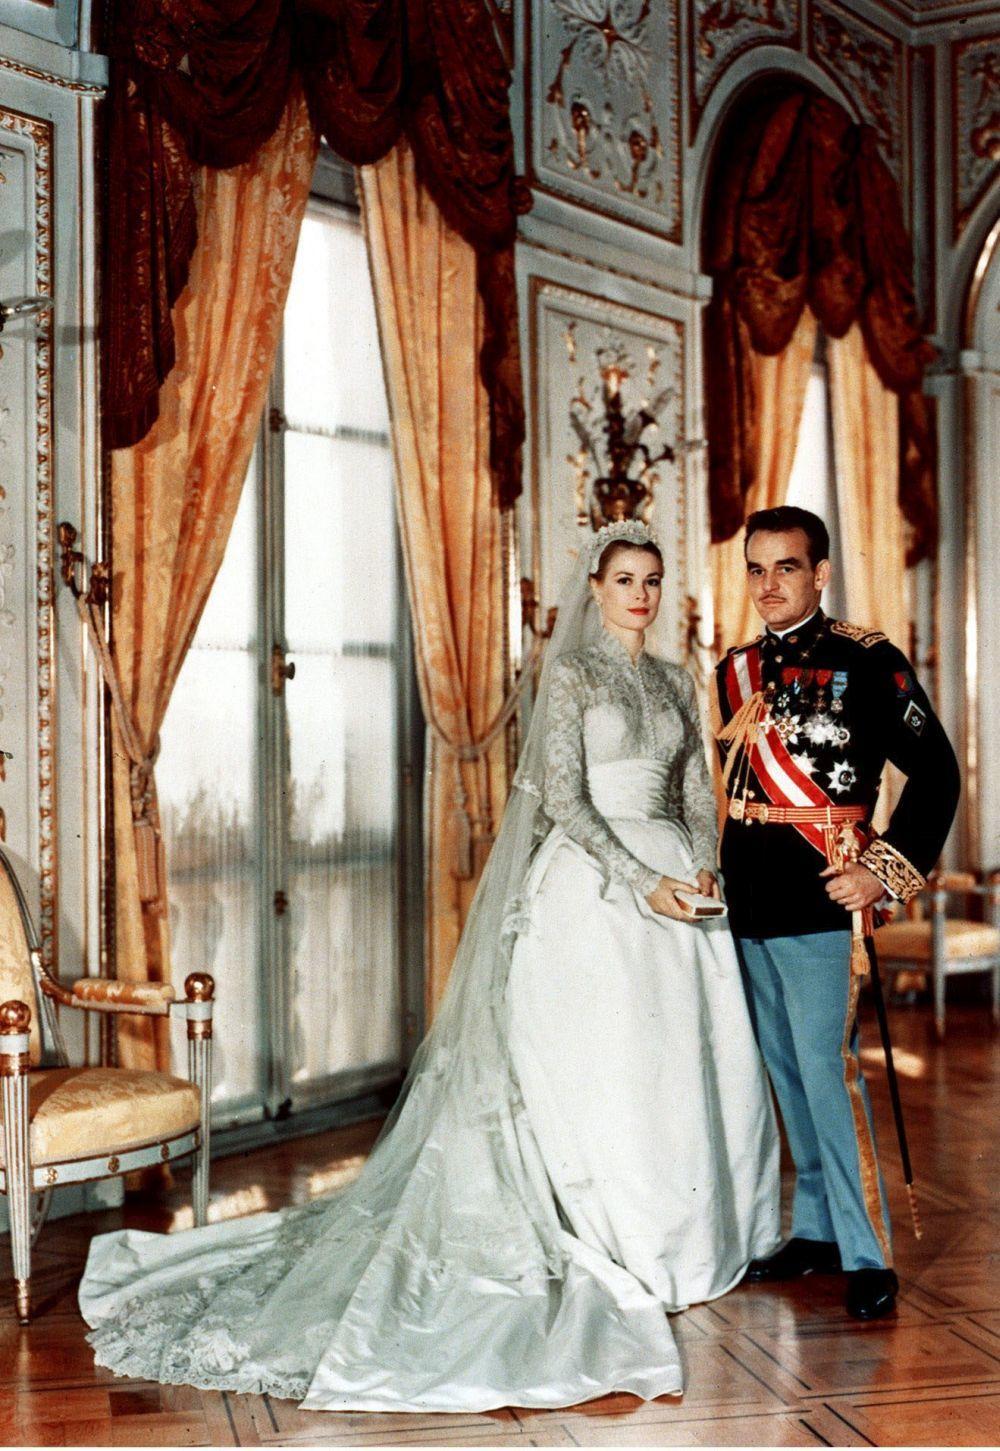 Principe Rainiero III de Mónaco en su boda con Grace Kelly